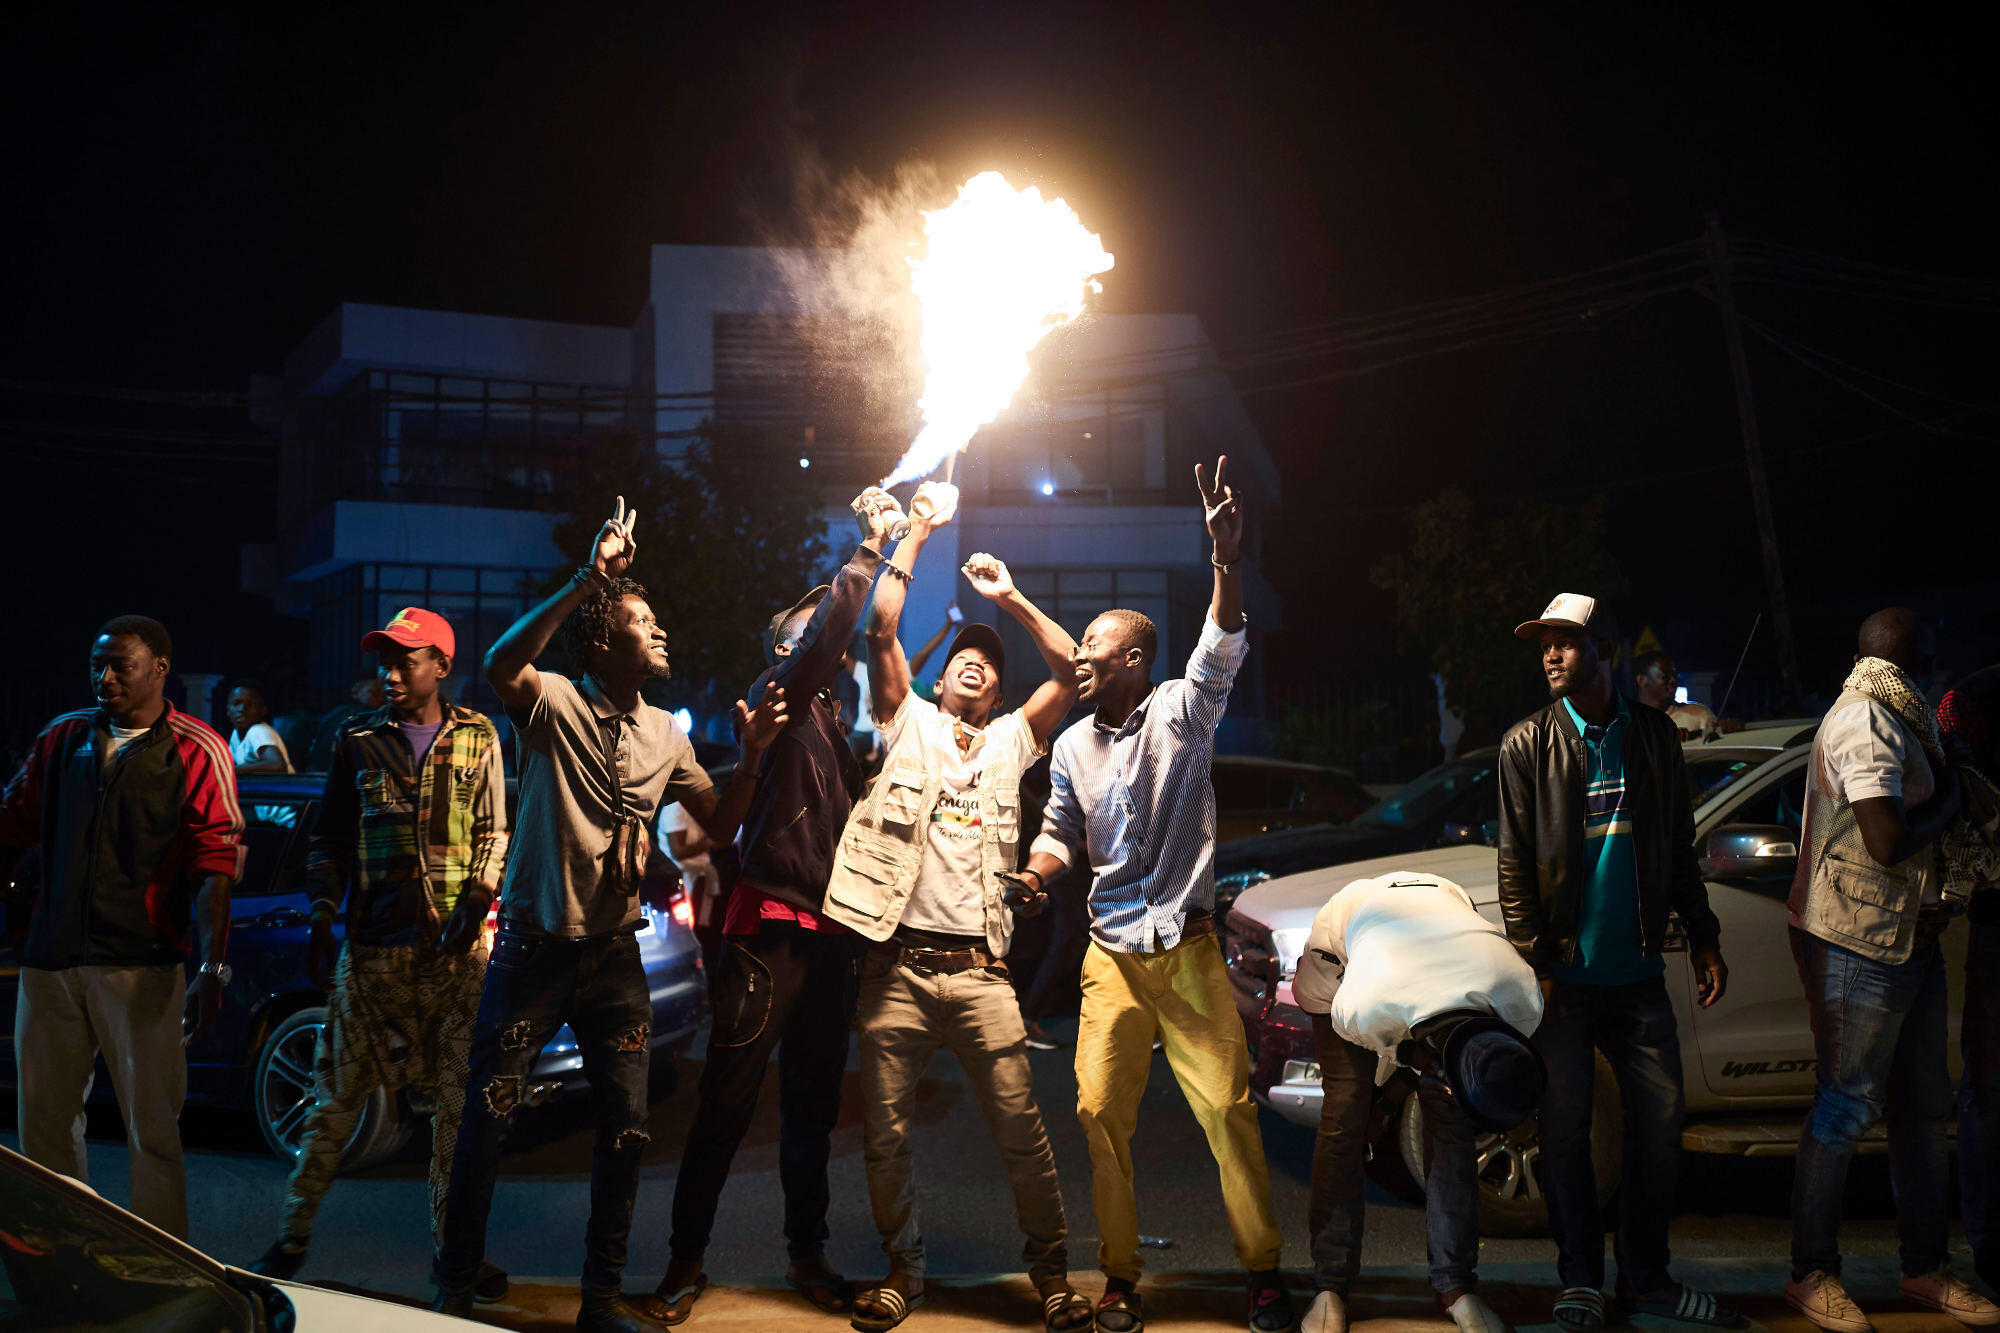 Supporters of incumbent President Sall celebrate in Dakar, 24 February 2019.